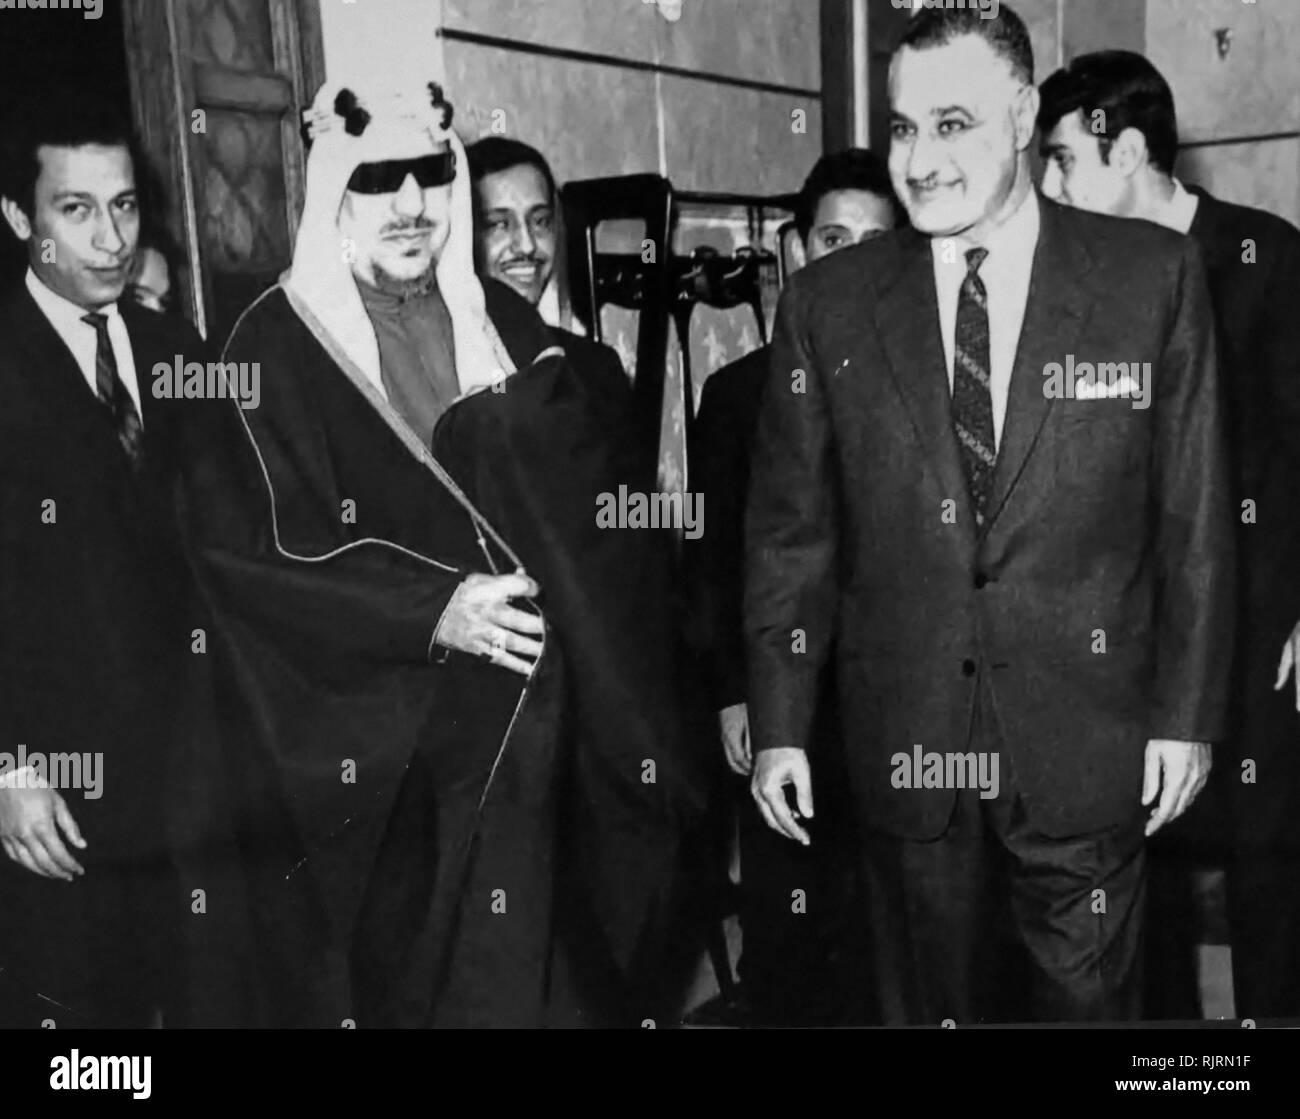 President Gamal Nasser of Egypt with Saud bin Abdul-Aziz Al Saud (1902 - 1969), King of Saudi Arabia from 1953 to 1964. - Stock Image